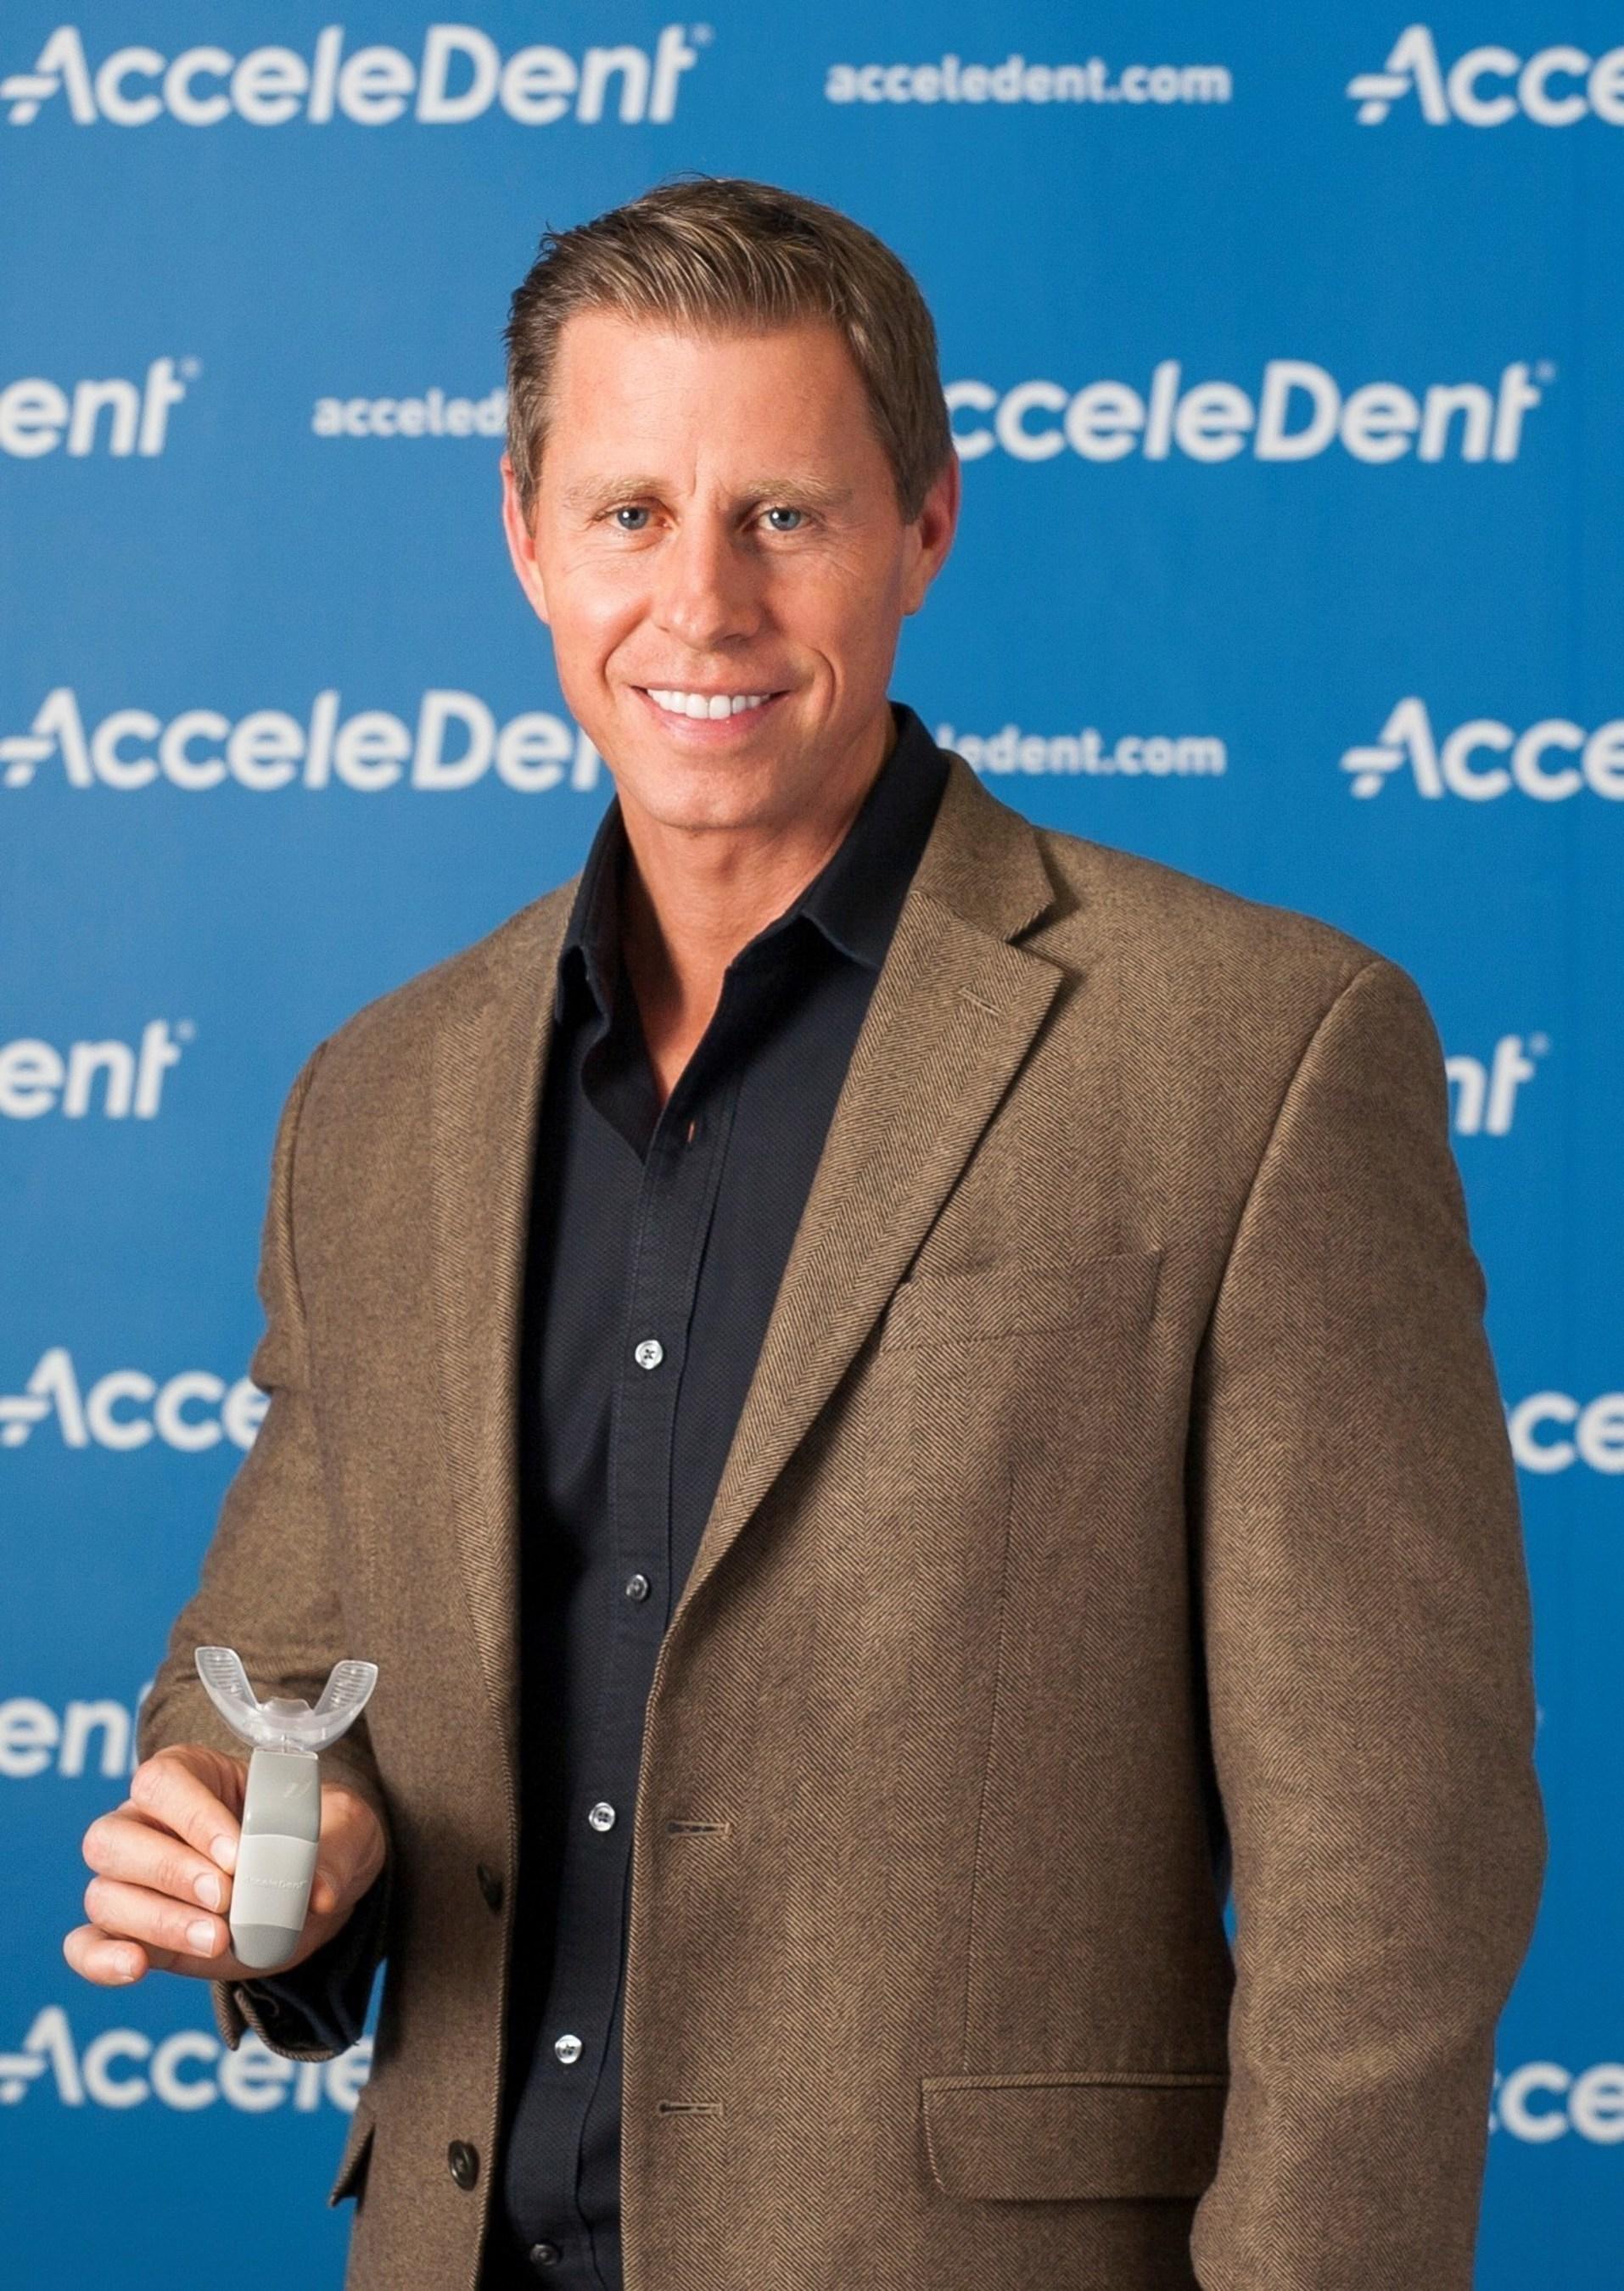 OrthoAccel, fabricante de AcceleDent, es elegido dentro de la lista Deloitte's 2015 Technology Fast